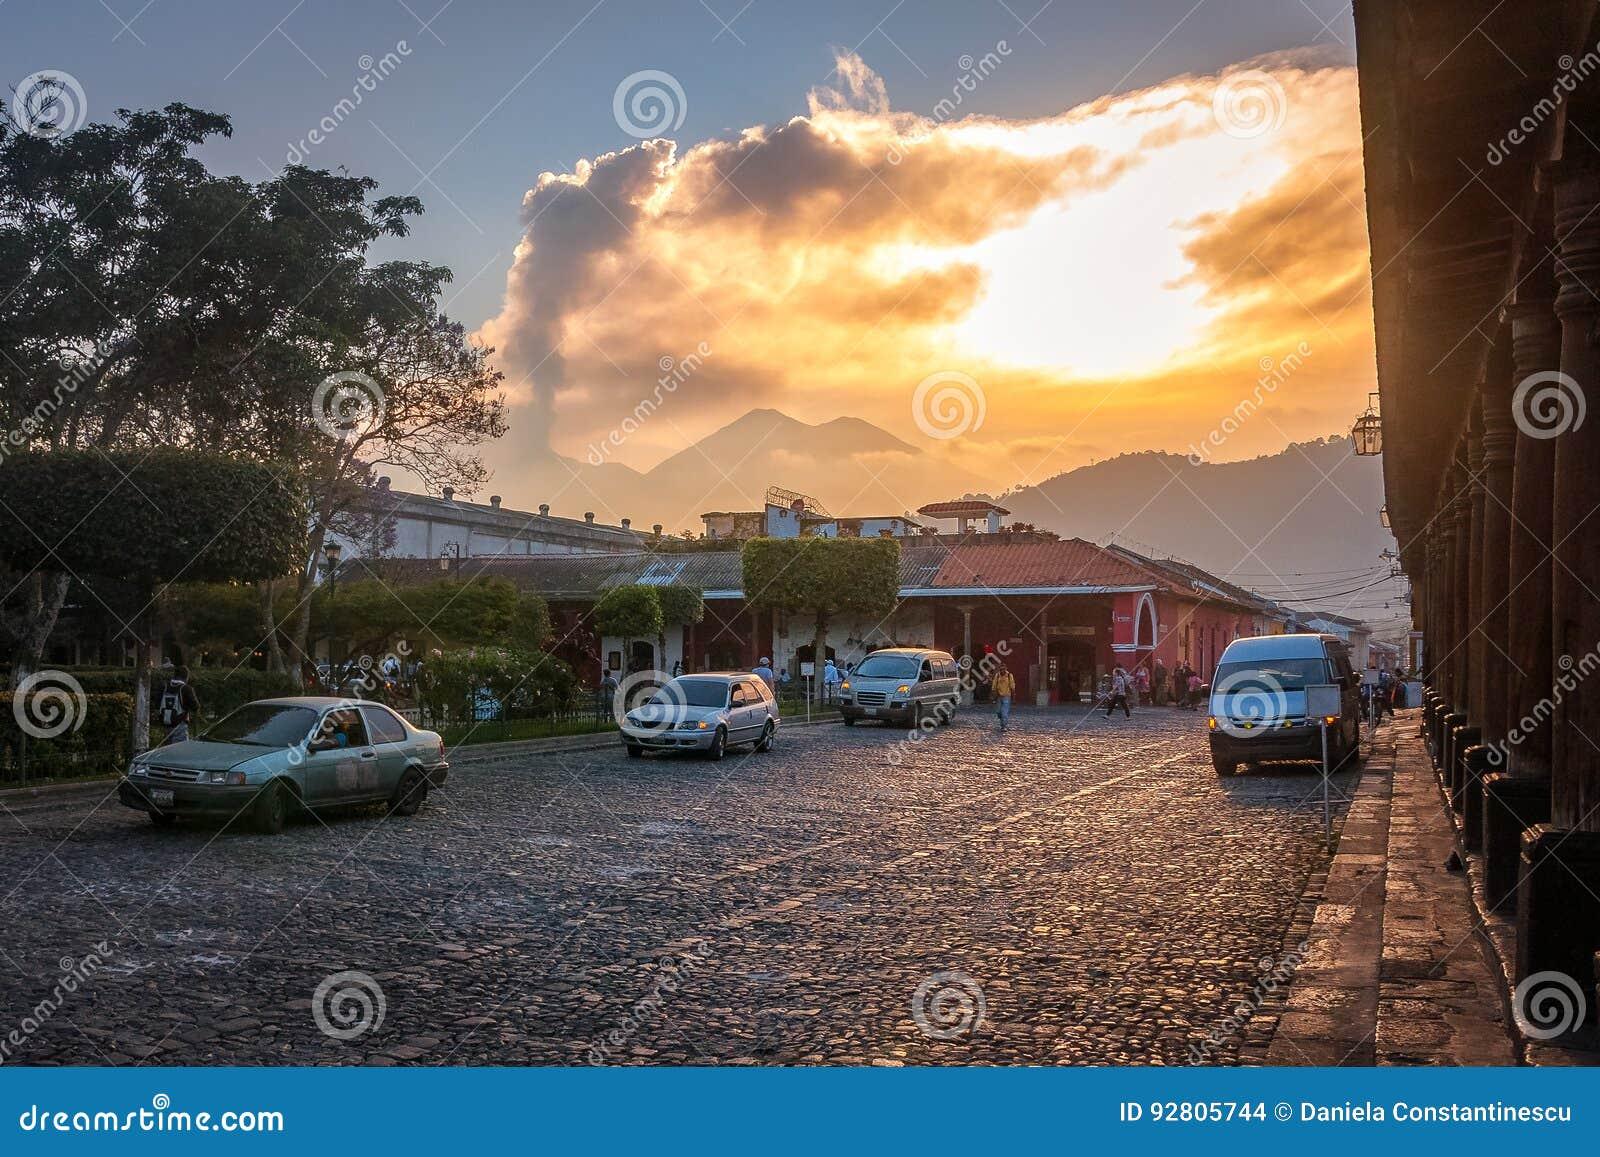 Vulcano sunset from the street level